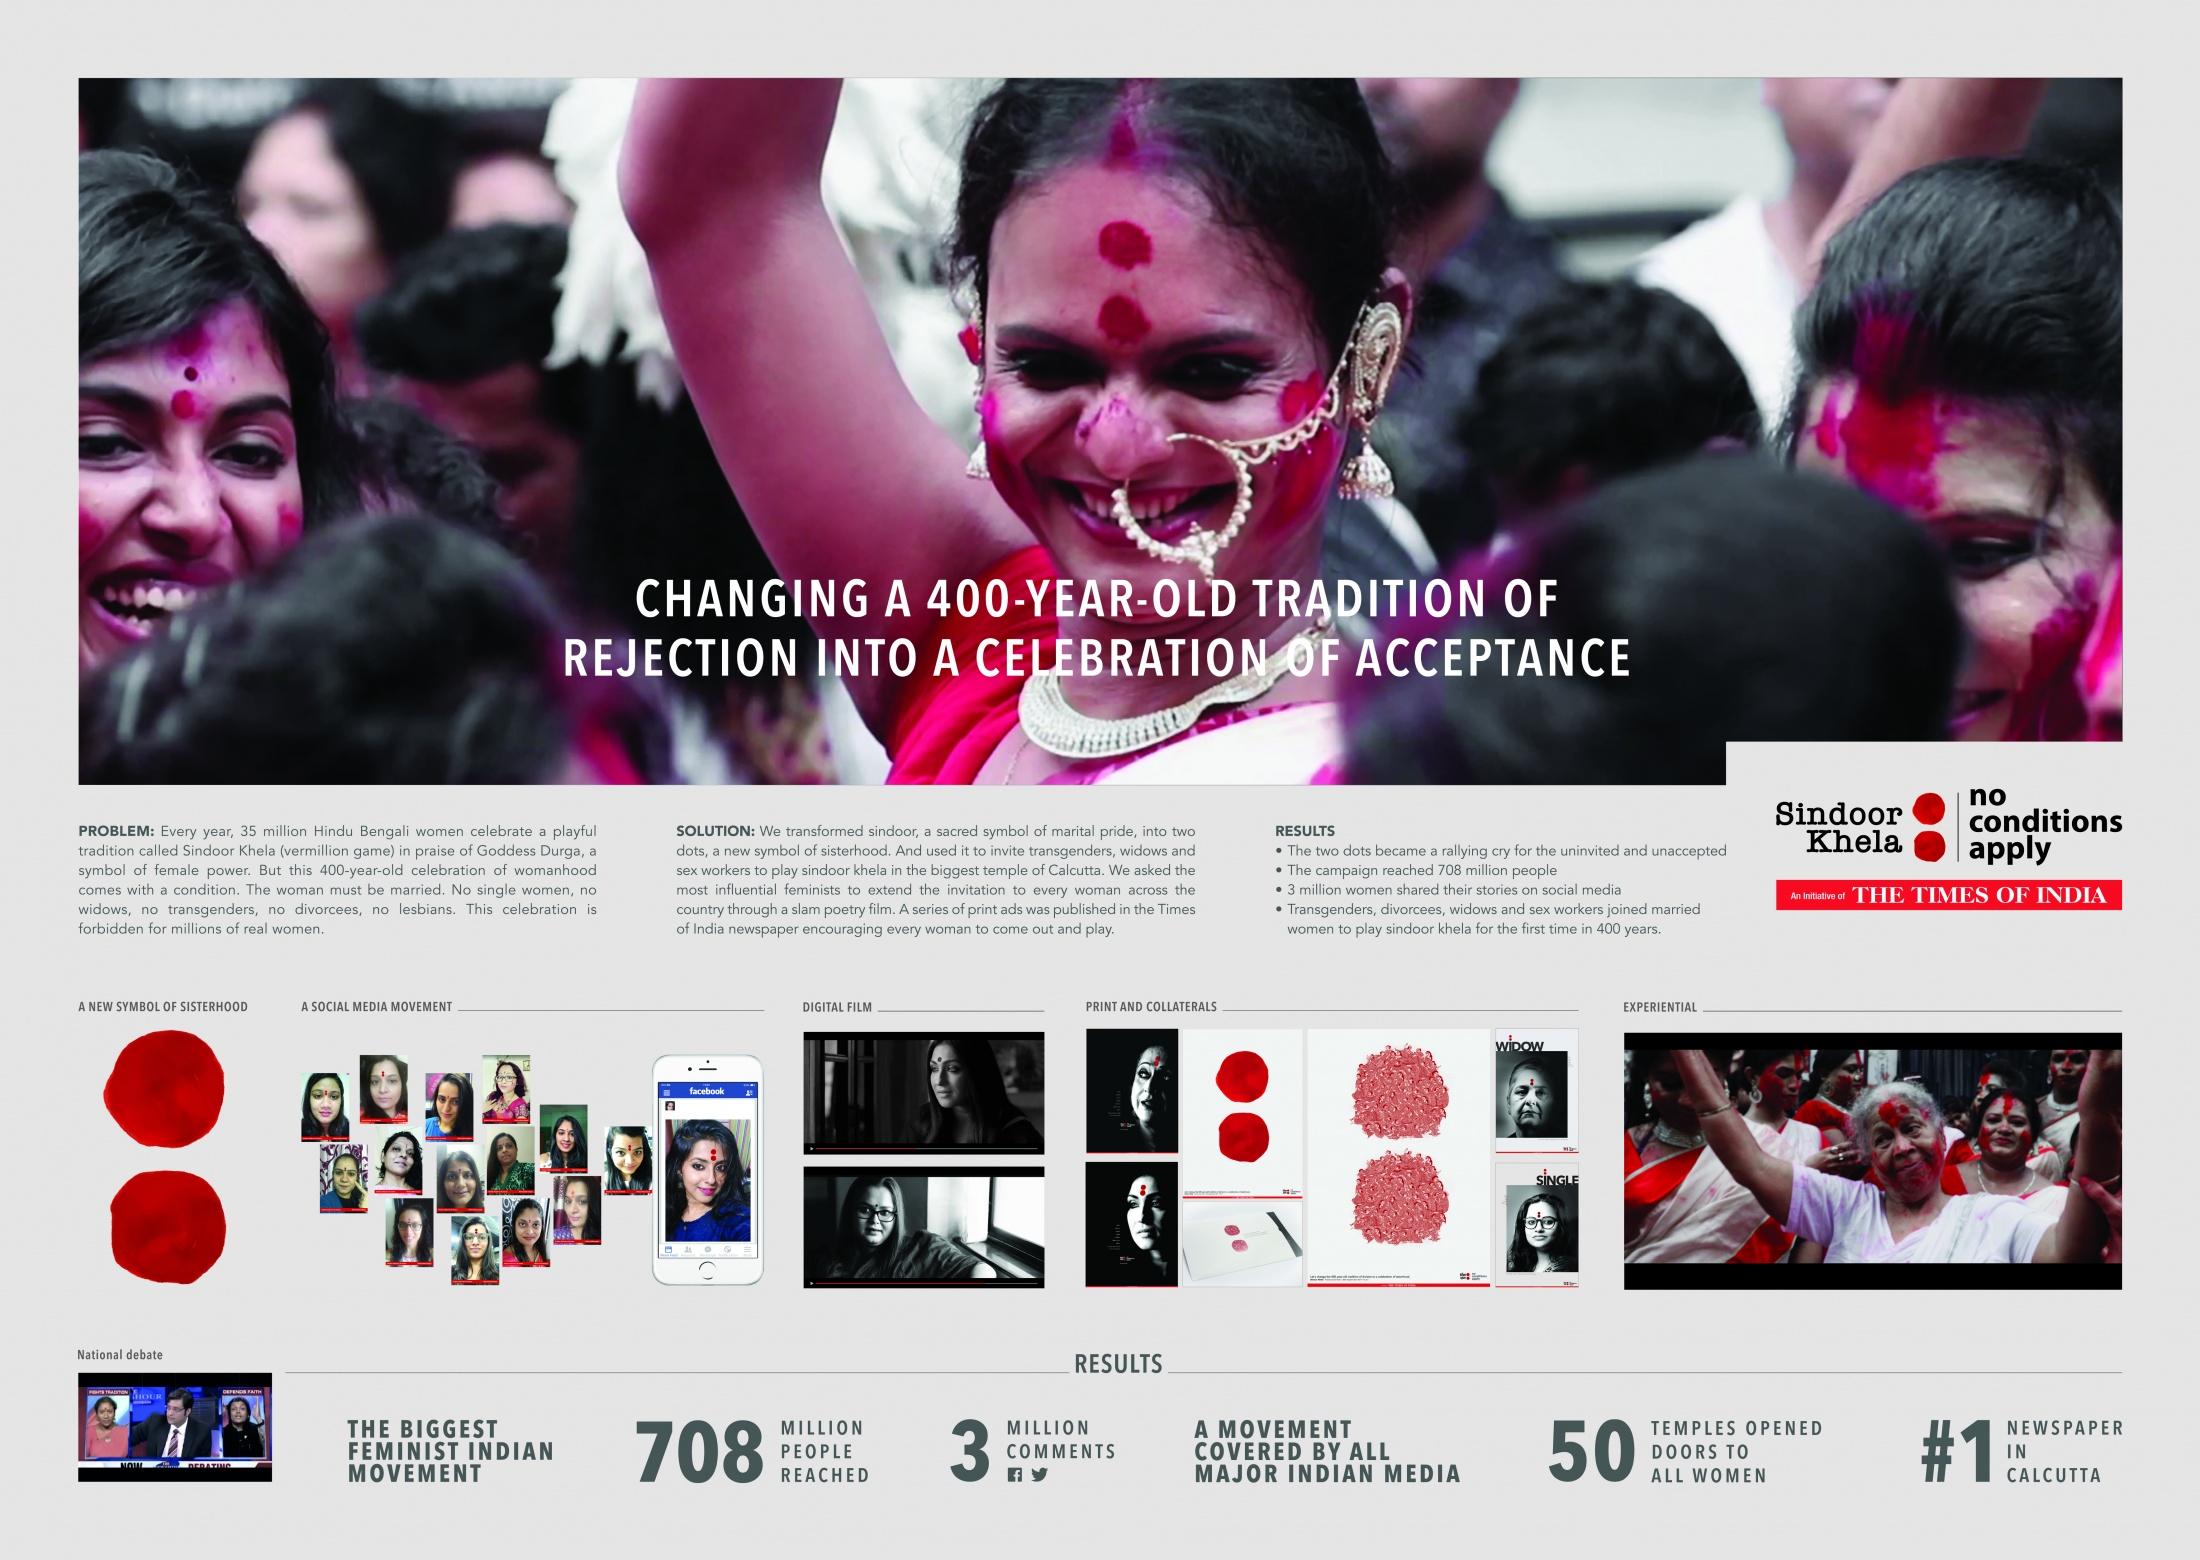 Thumbnail for Sindoor Khela - No Conditions Apply